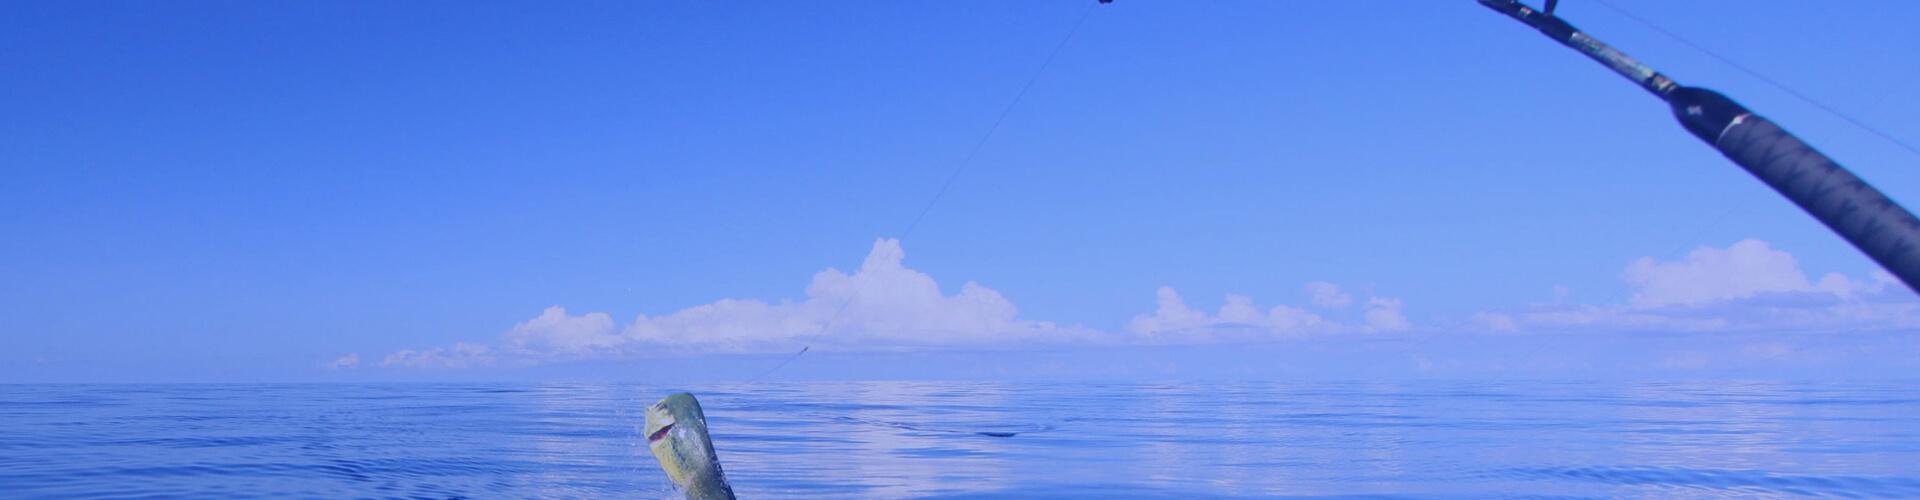 Key West Fishing Charter